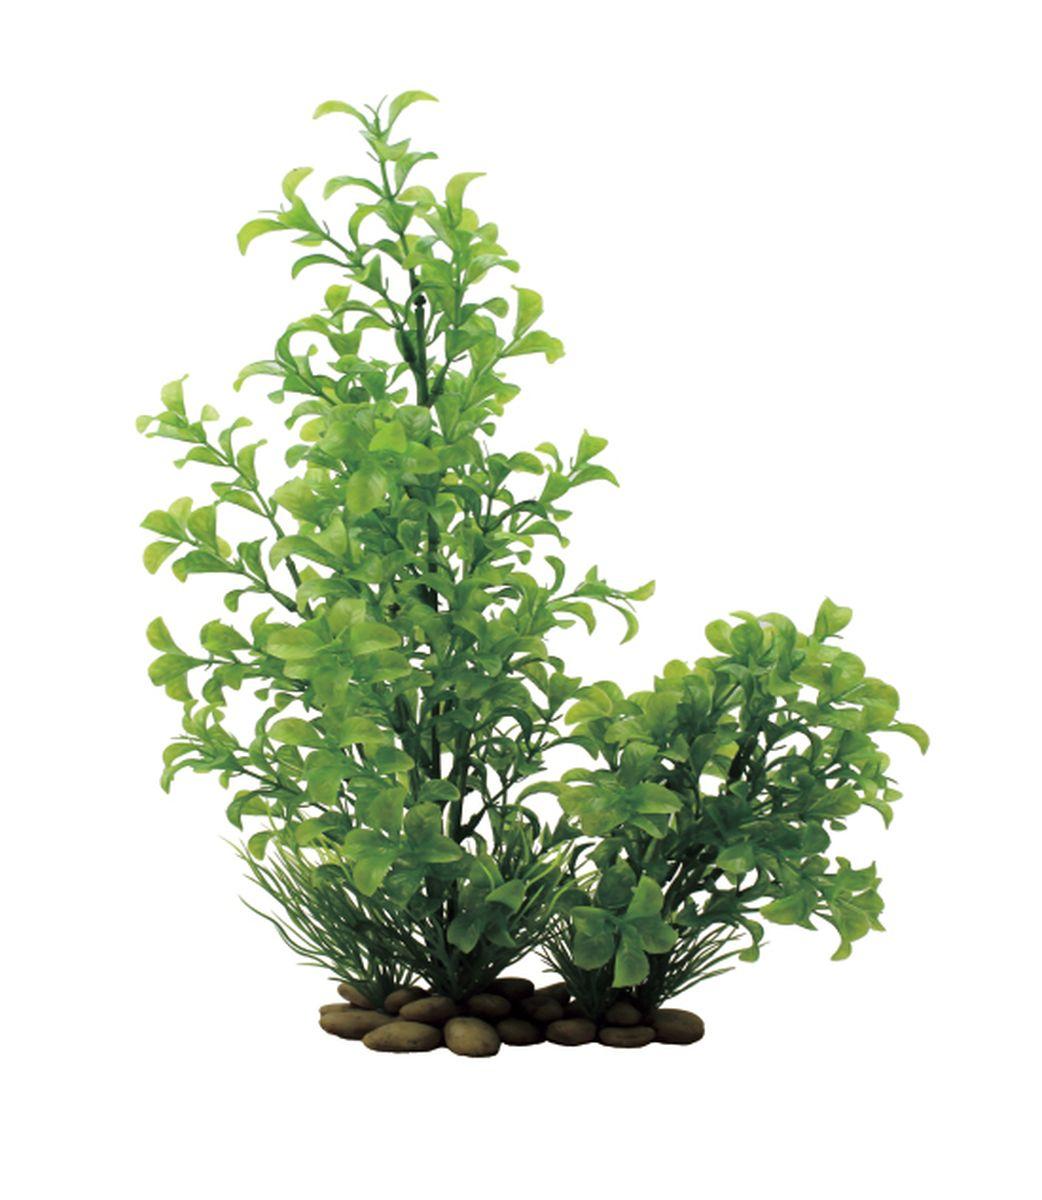 Растение для аквариума ArtUniq Людвигия зеленая, высота 30 смART-1150206Растение для аквариума ArtUniq Людвигия зеленая, высота 30 см